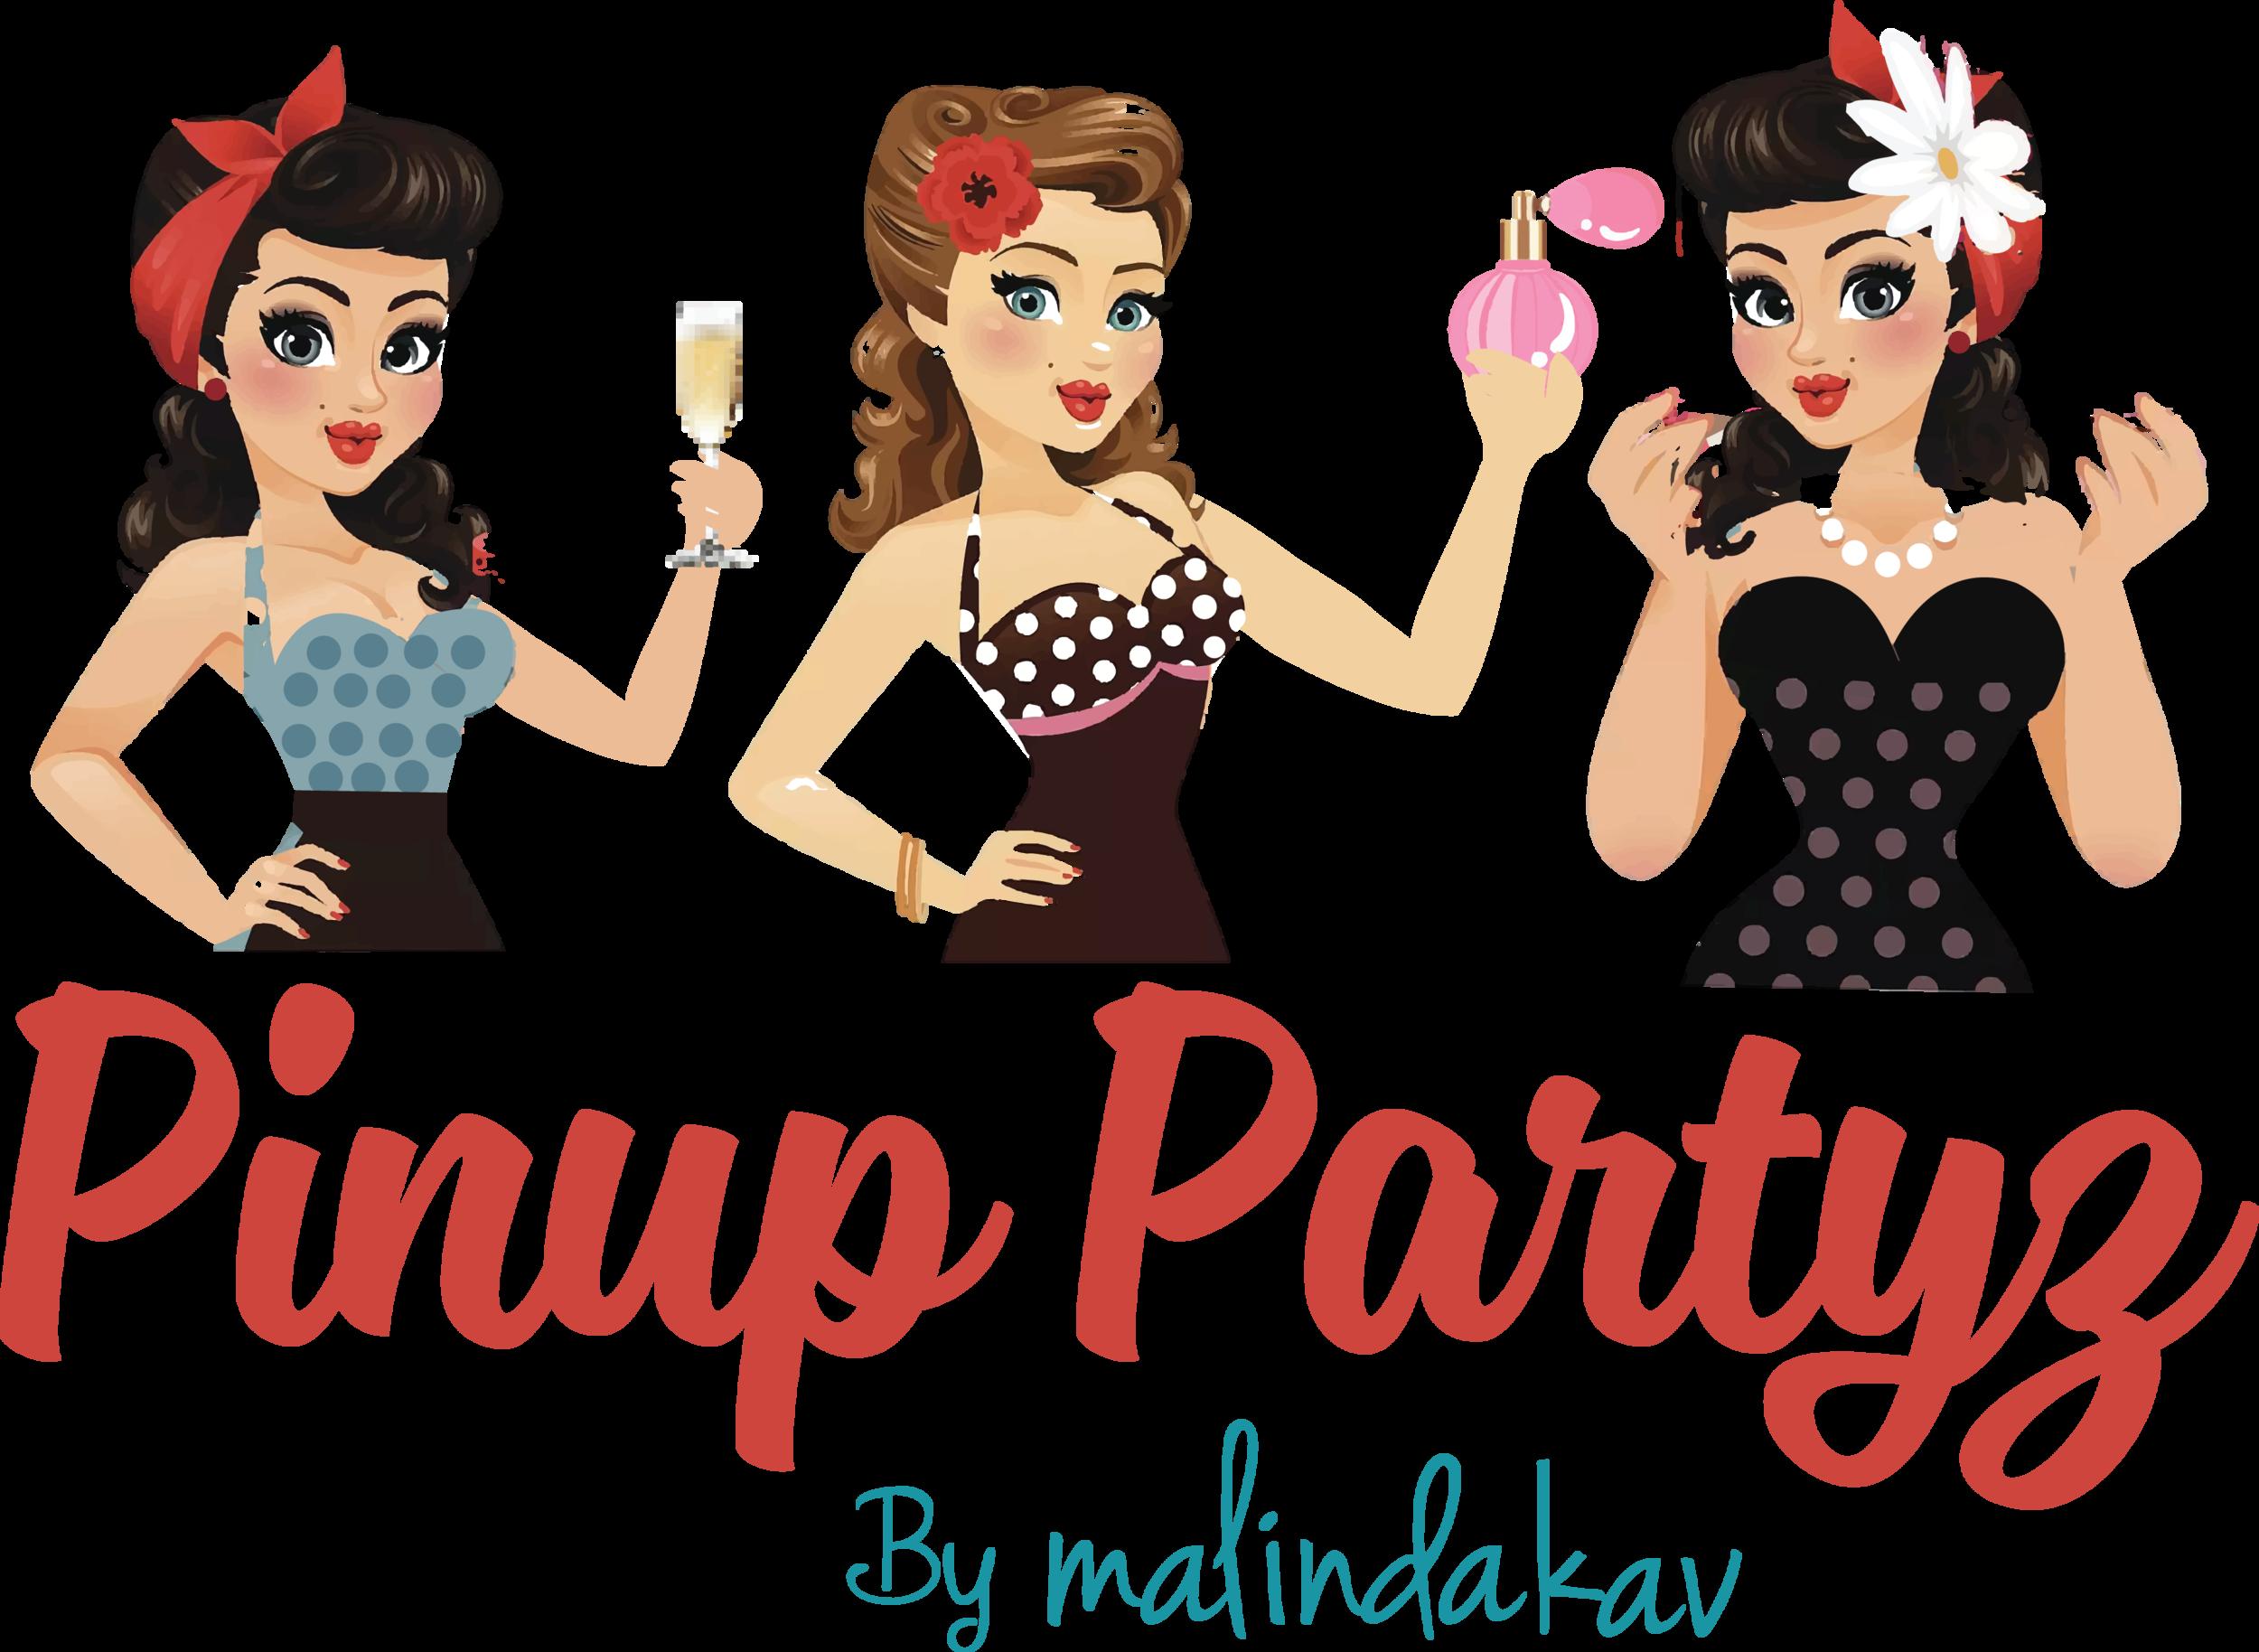 Pinup Partyz transparent_file (2).png